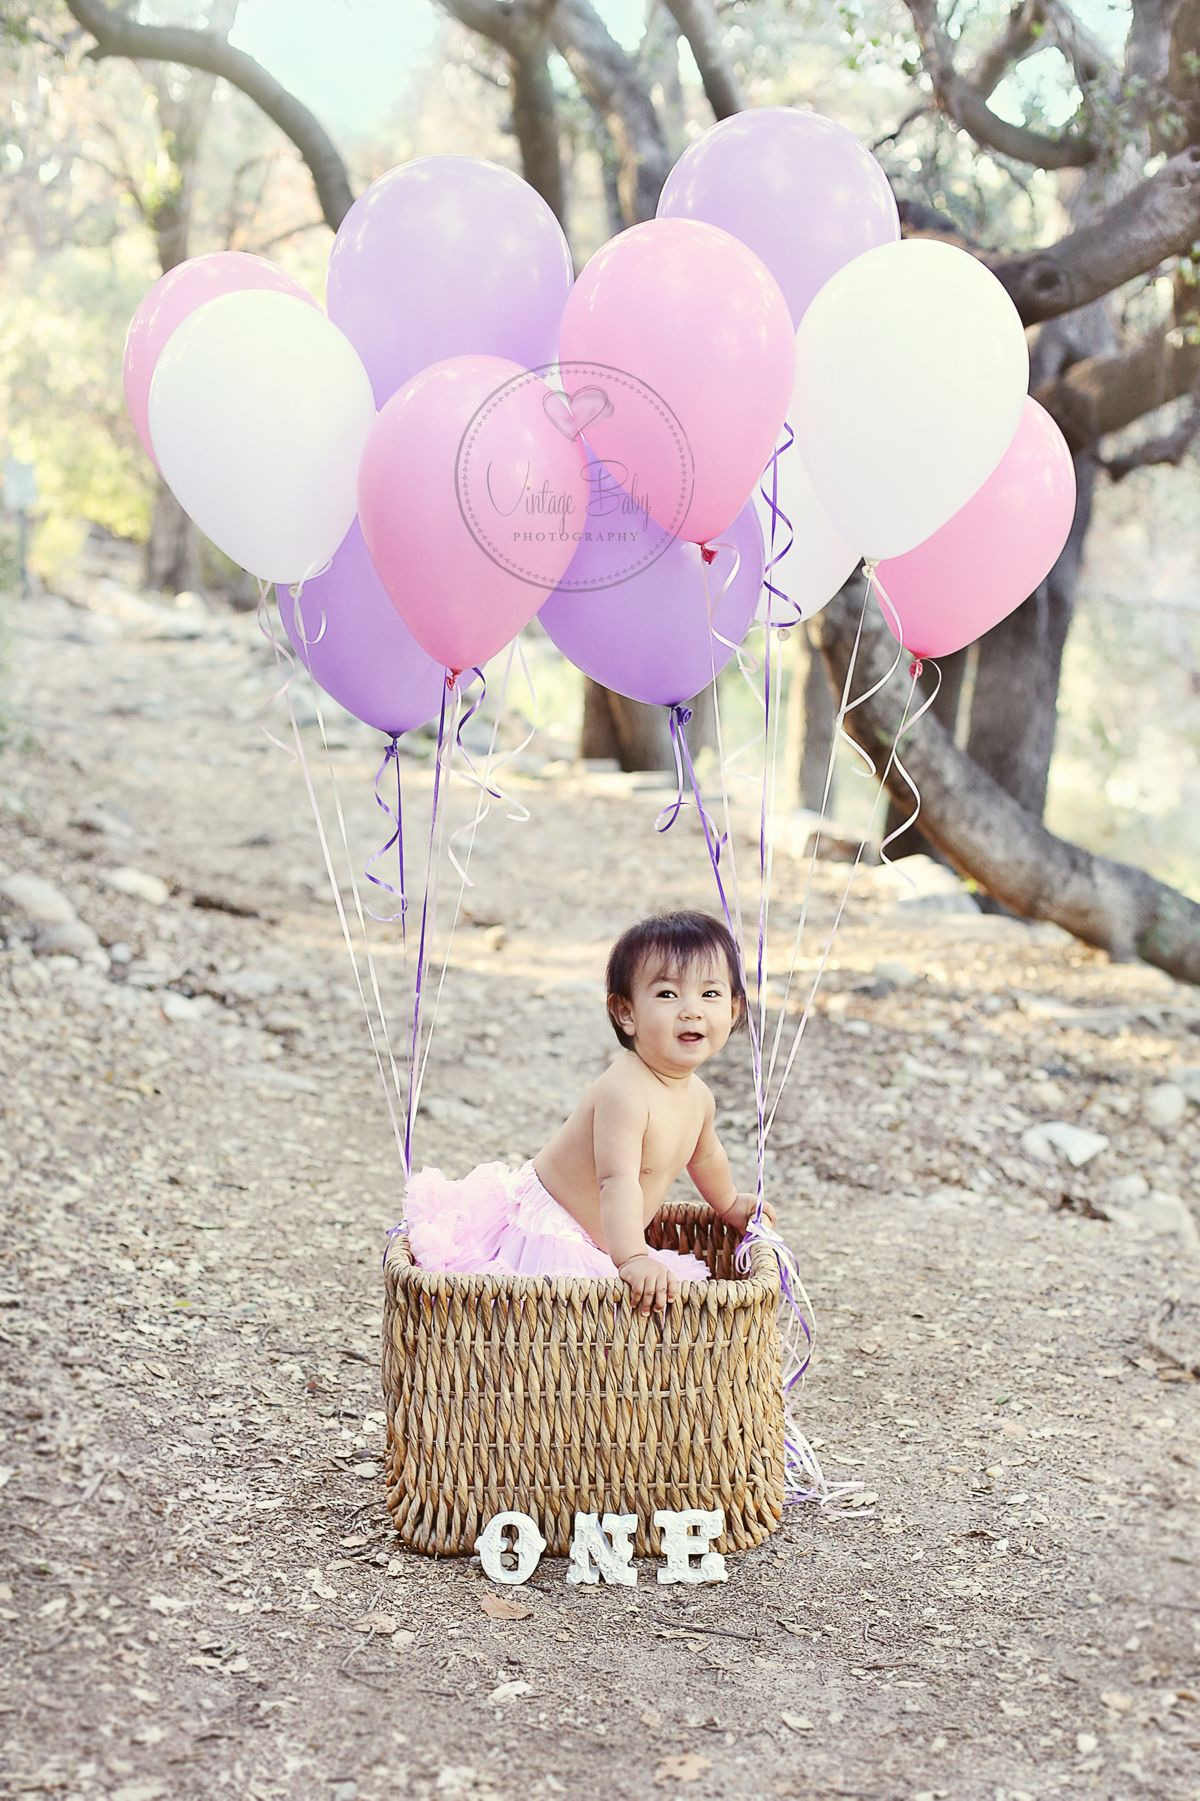 1st Birthday Photography Balloons Basket Hot Air Balloon